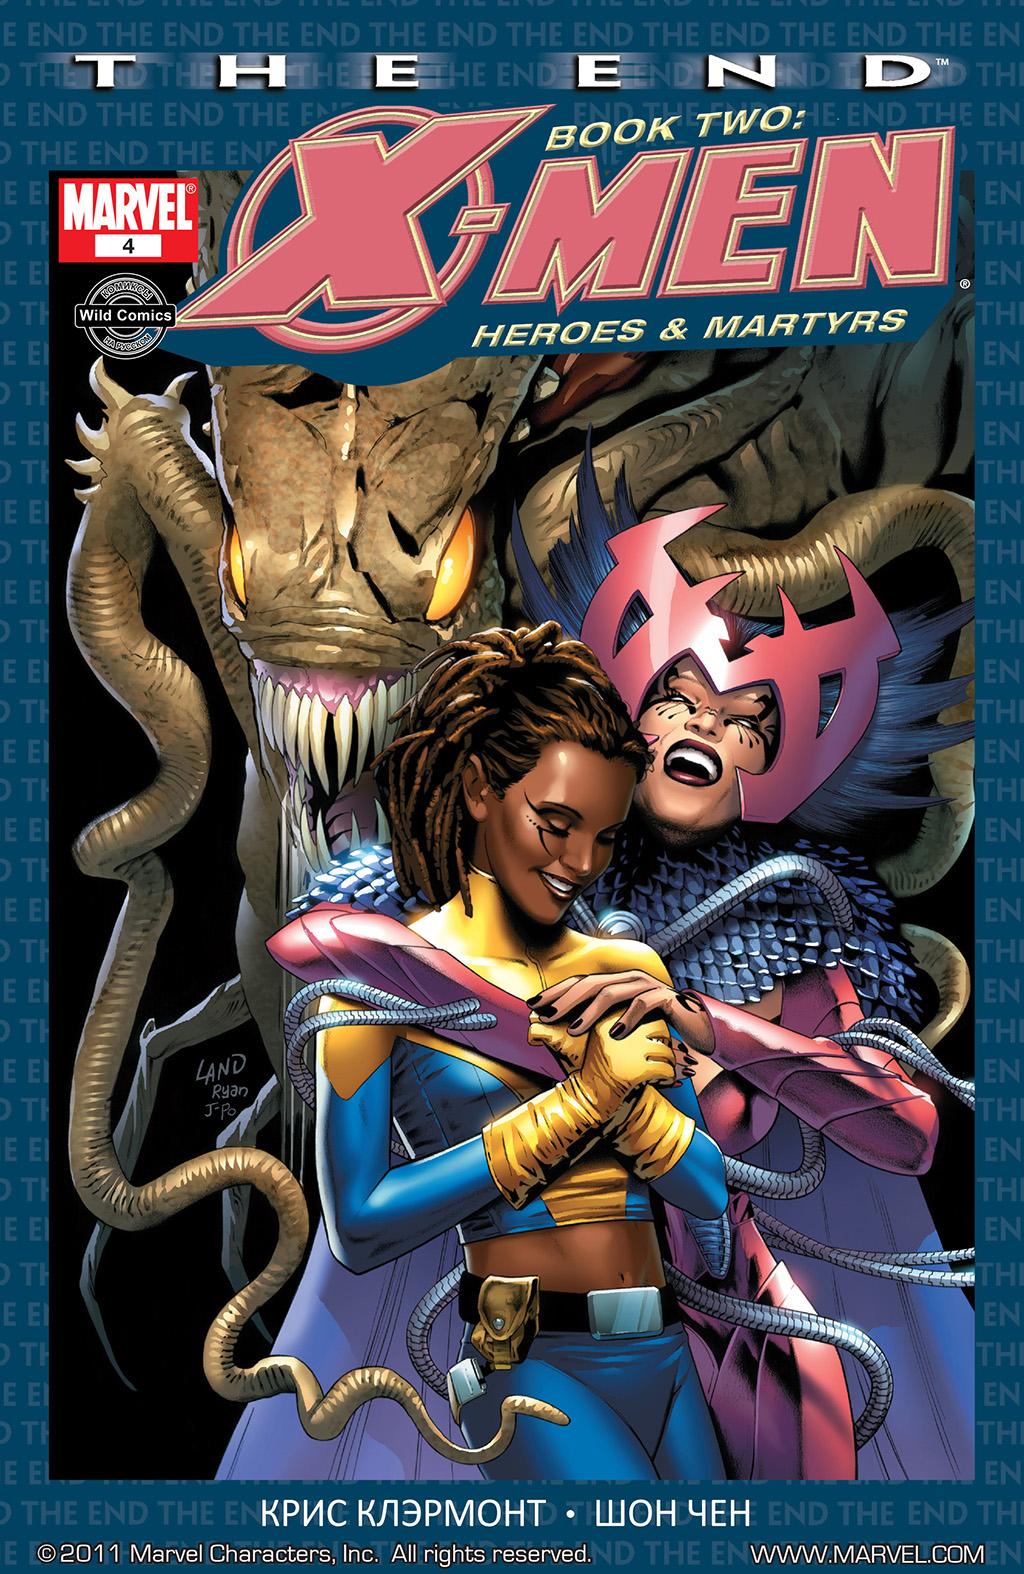 комикс Люди-Икс - Конец том 2